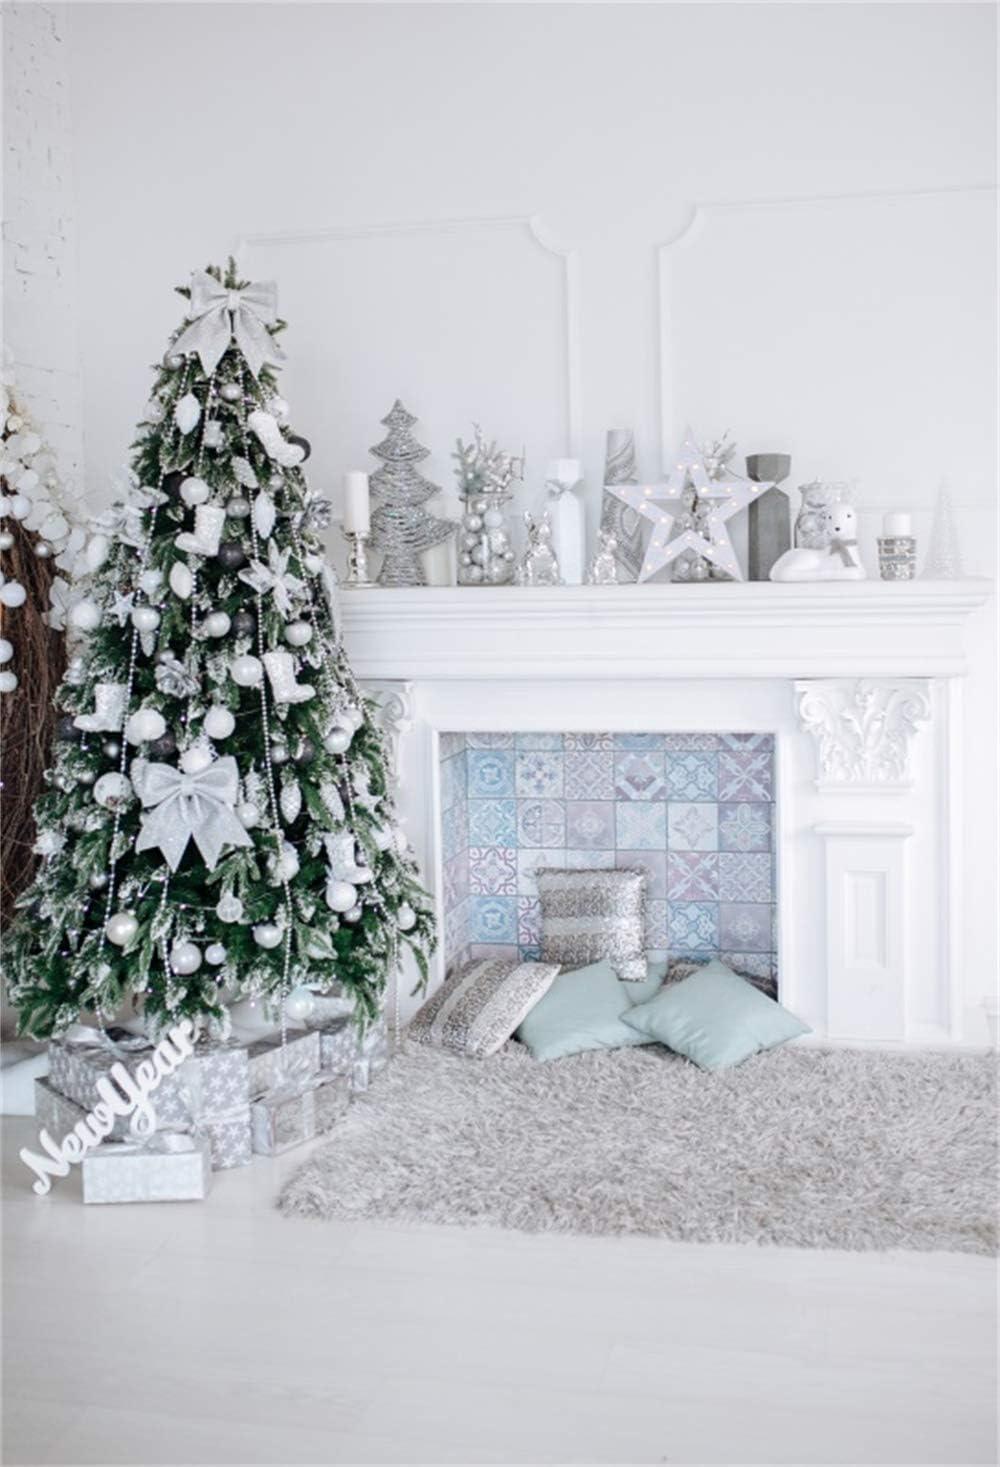 Christmas Digital Photography Backdrop Newborn Photo Shoot Prop Baby Boy Background Lilac Ornaments 5 feet